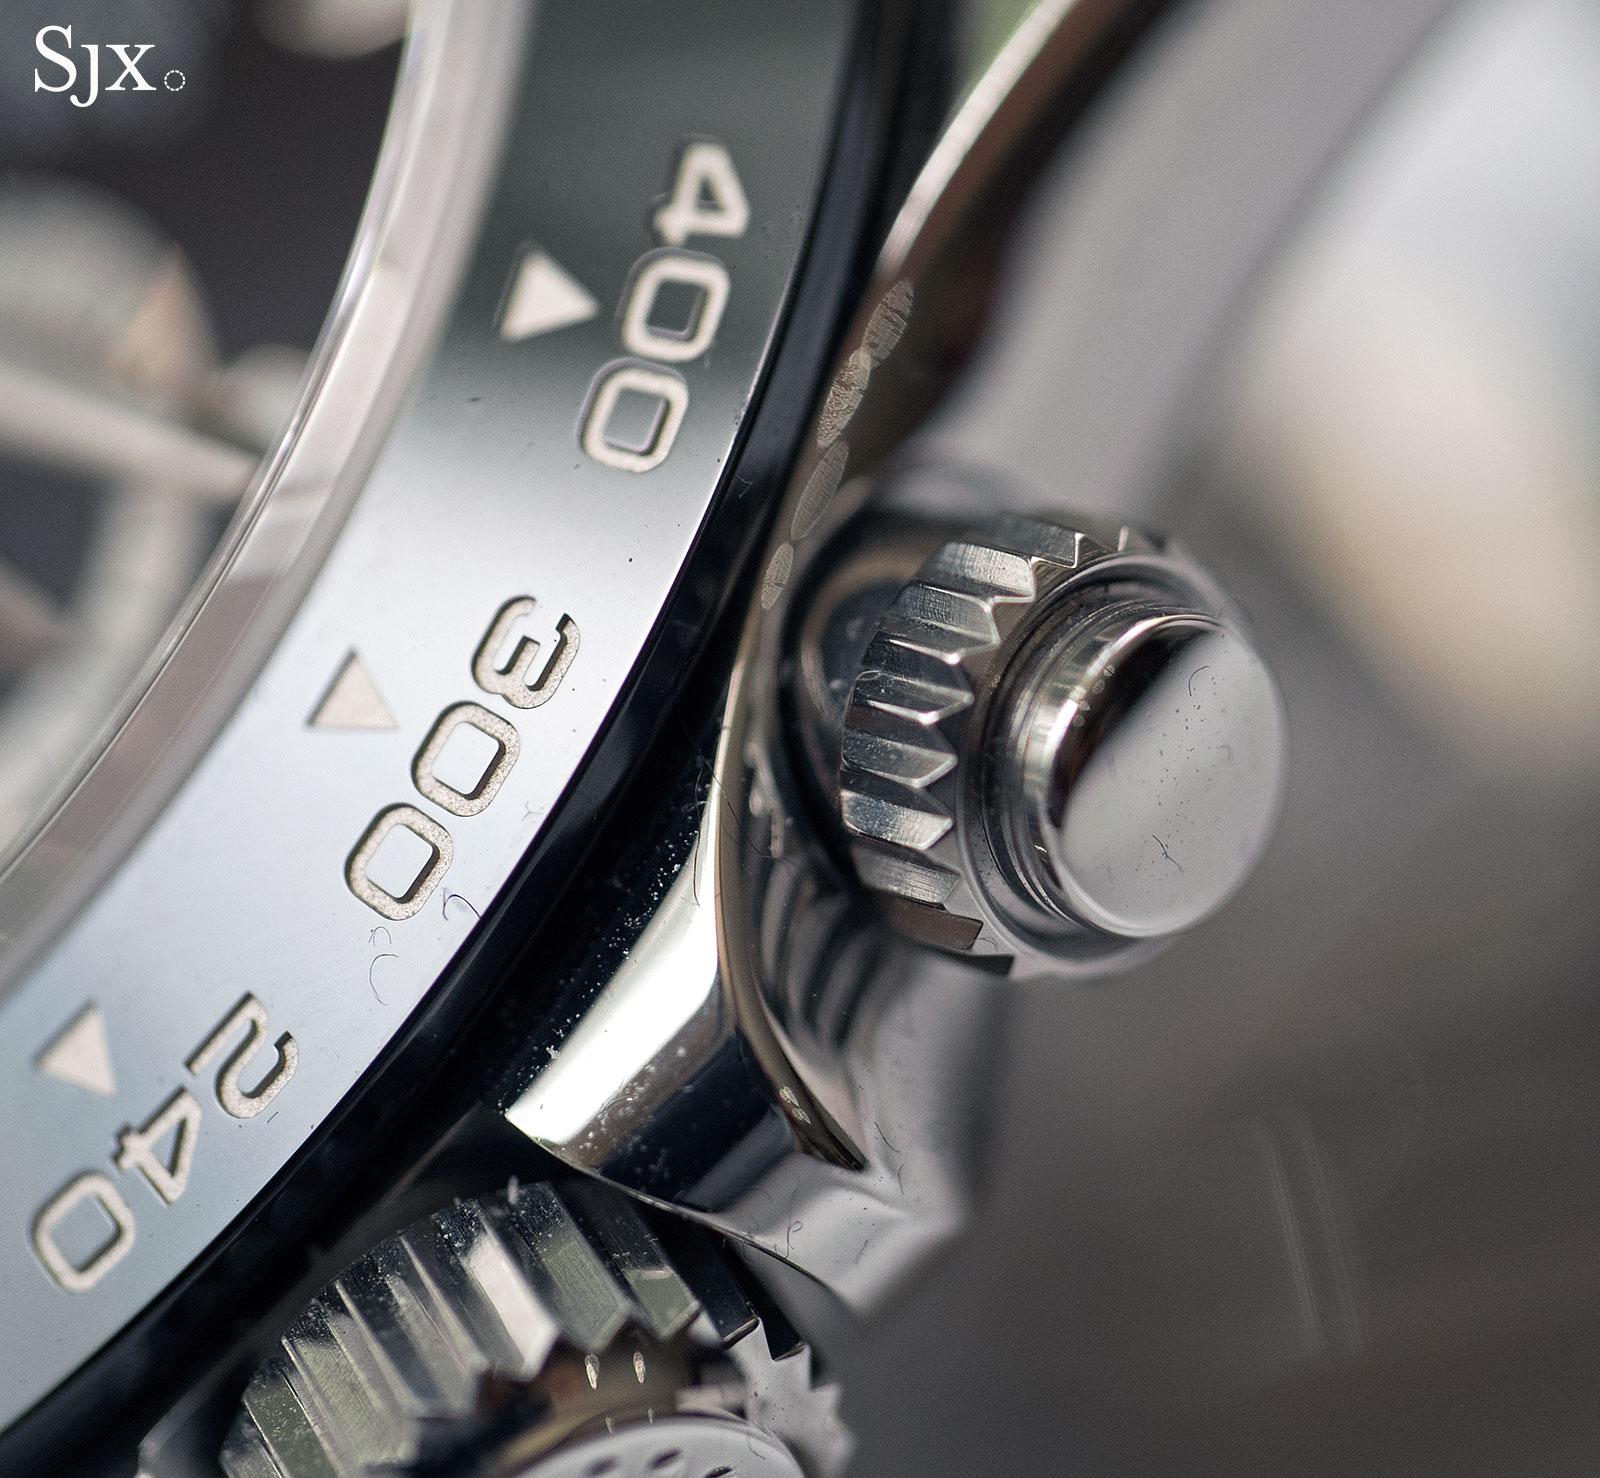 Rolex Daytona Ceramic Black Dial 116500LN - 4